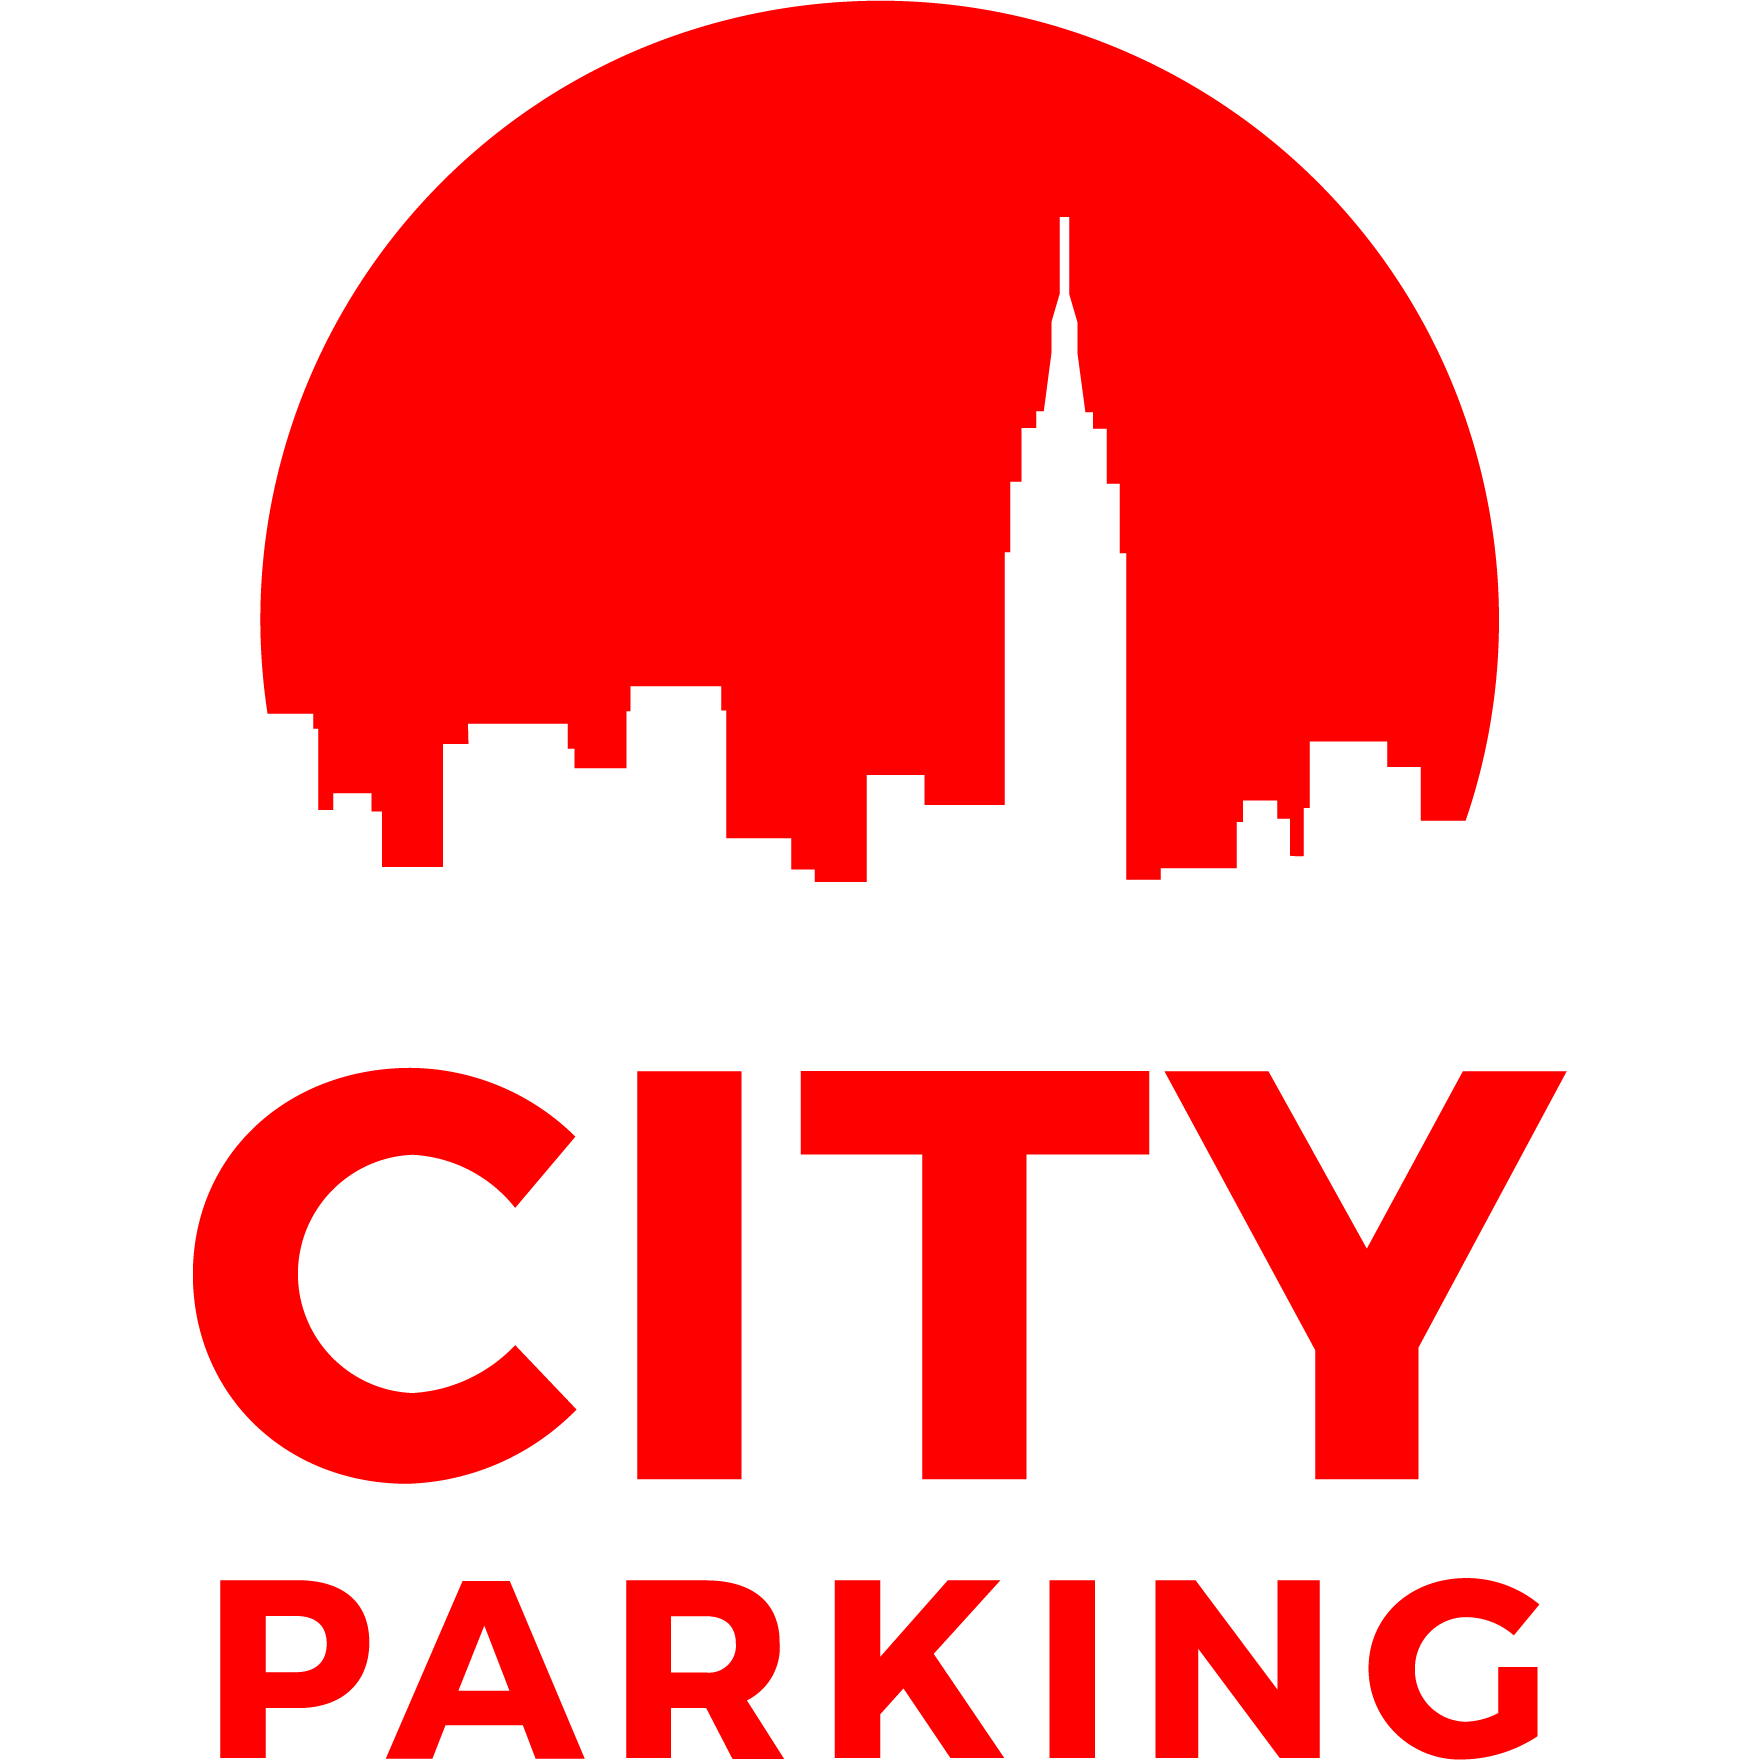 CITY PARKING- Garment One Garage LLC